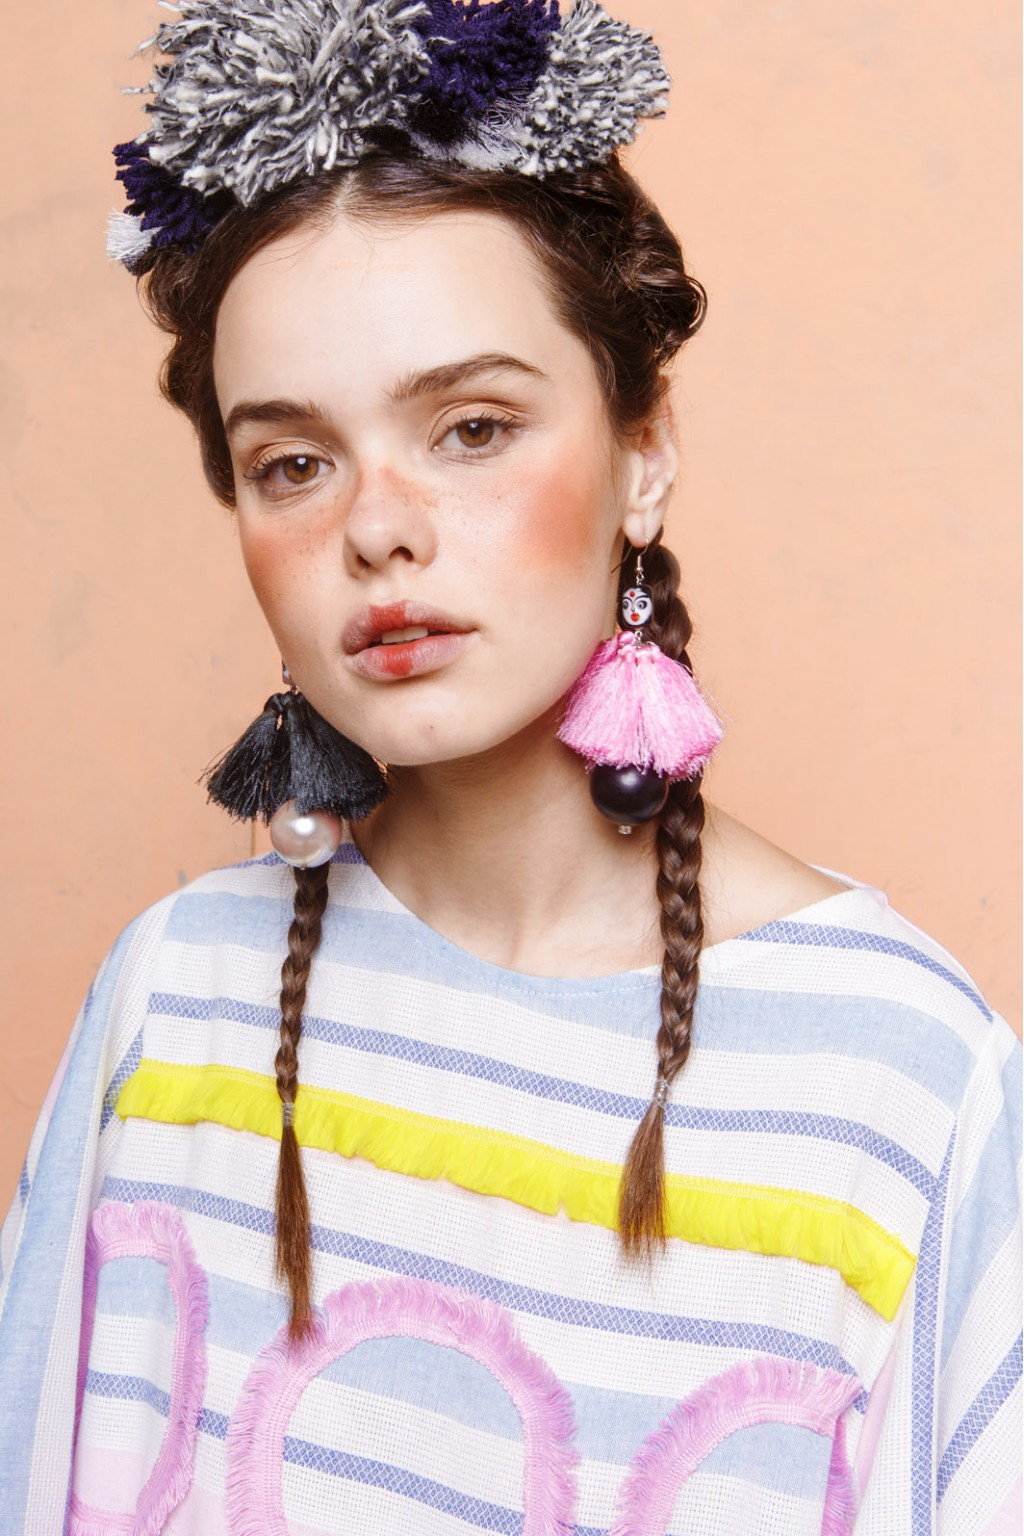 LALA EARRINGS MIX GREY PINK